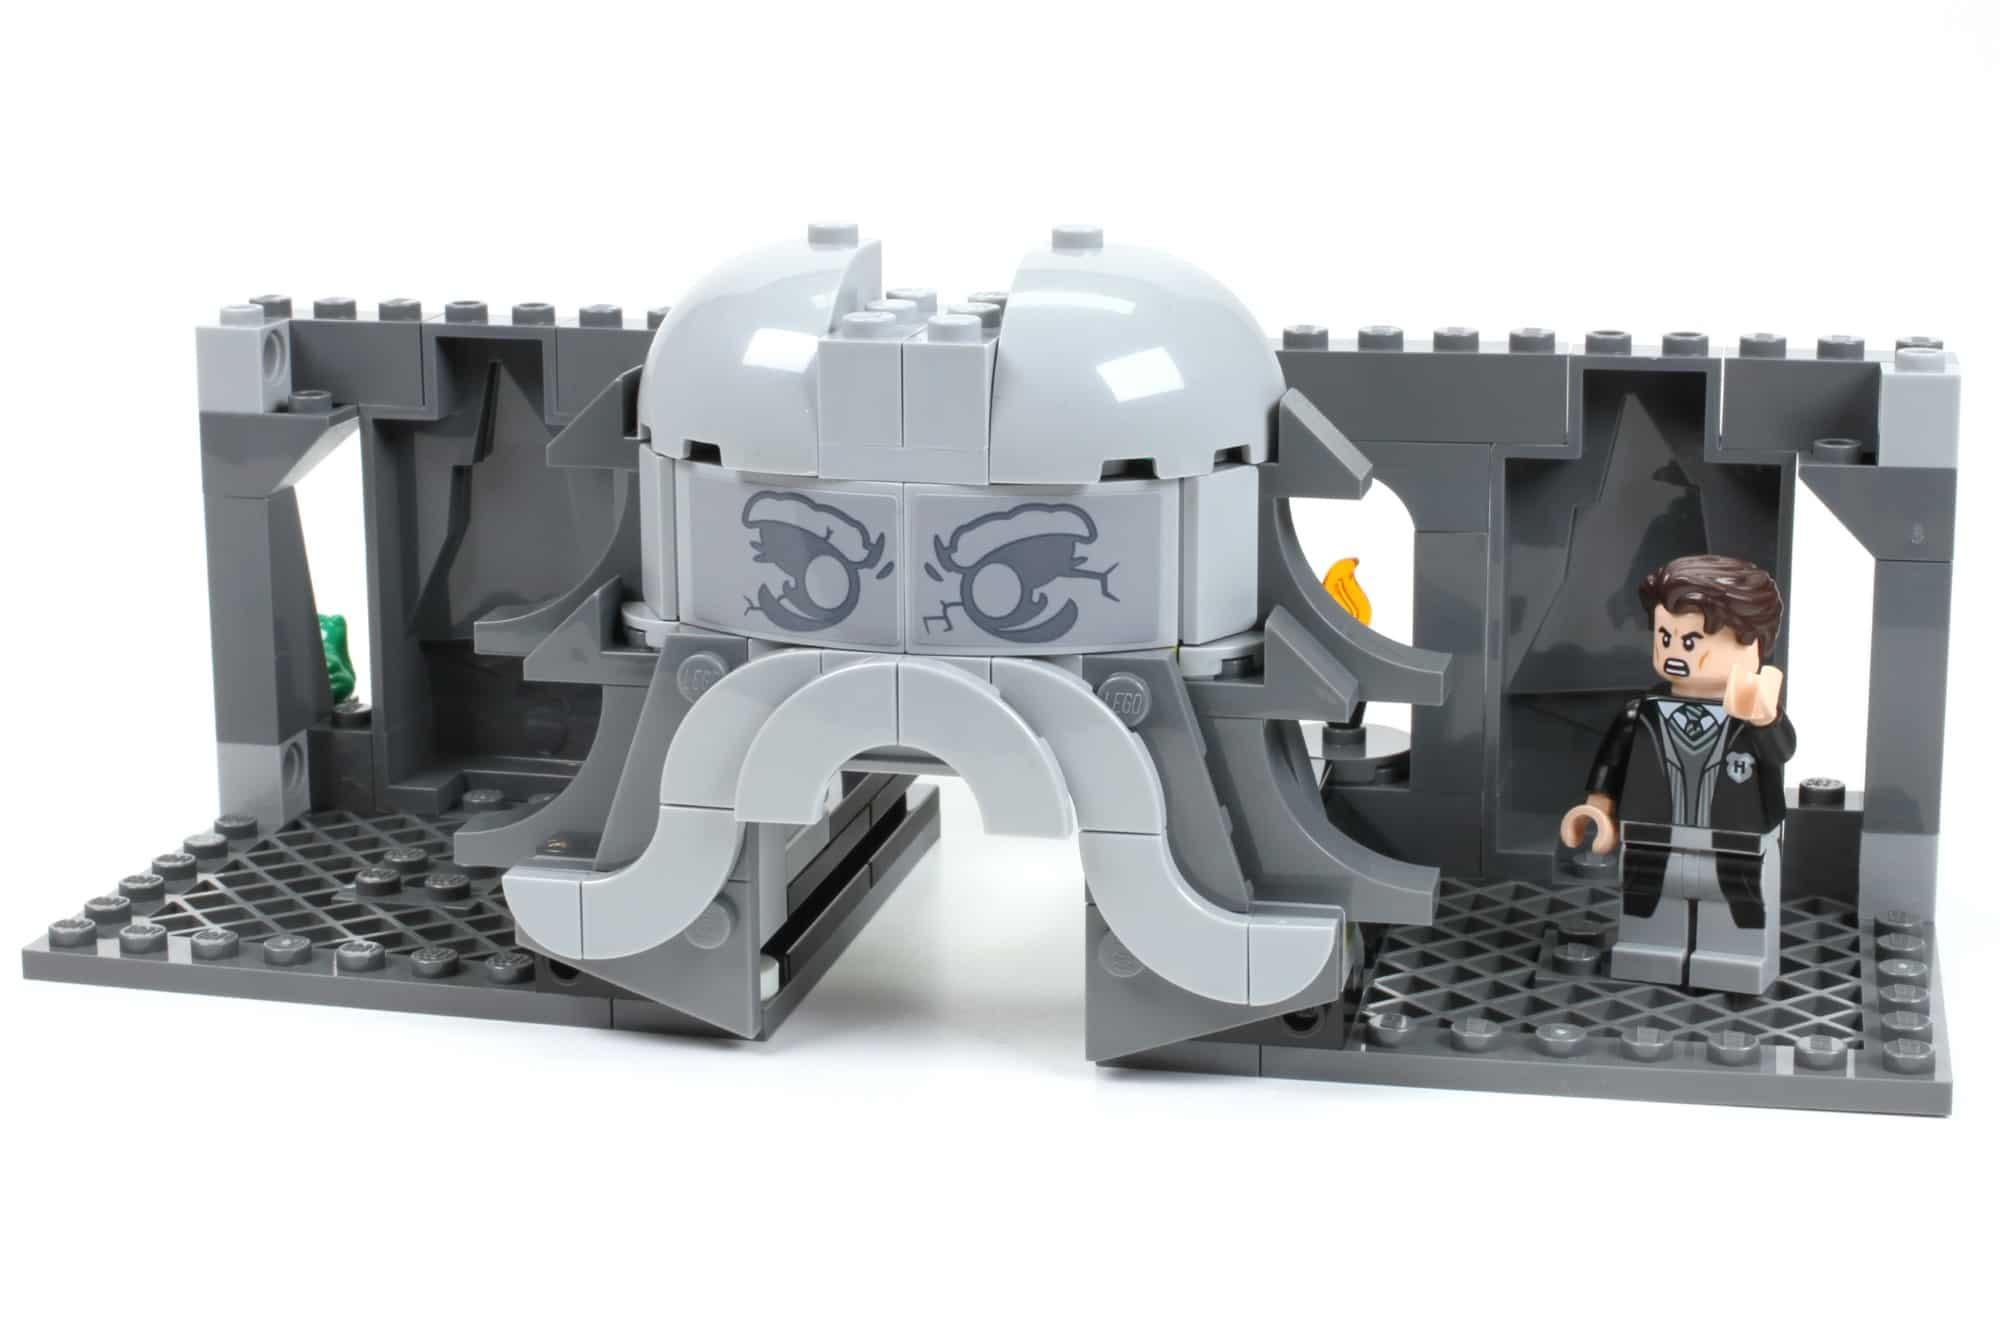 LEGO Harry Potter 76389 Hogwarts Kammer Des Schreckens Schritt 8 2